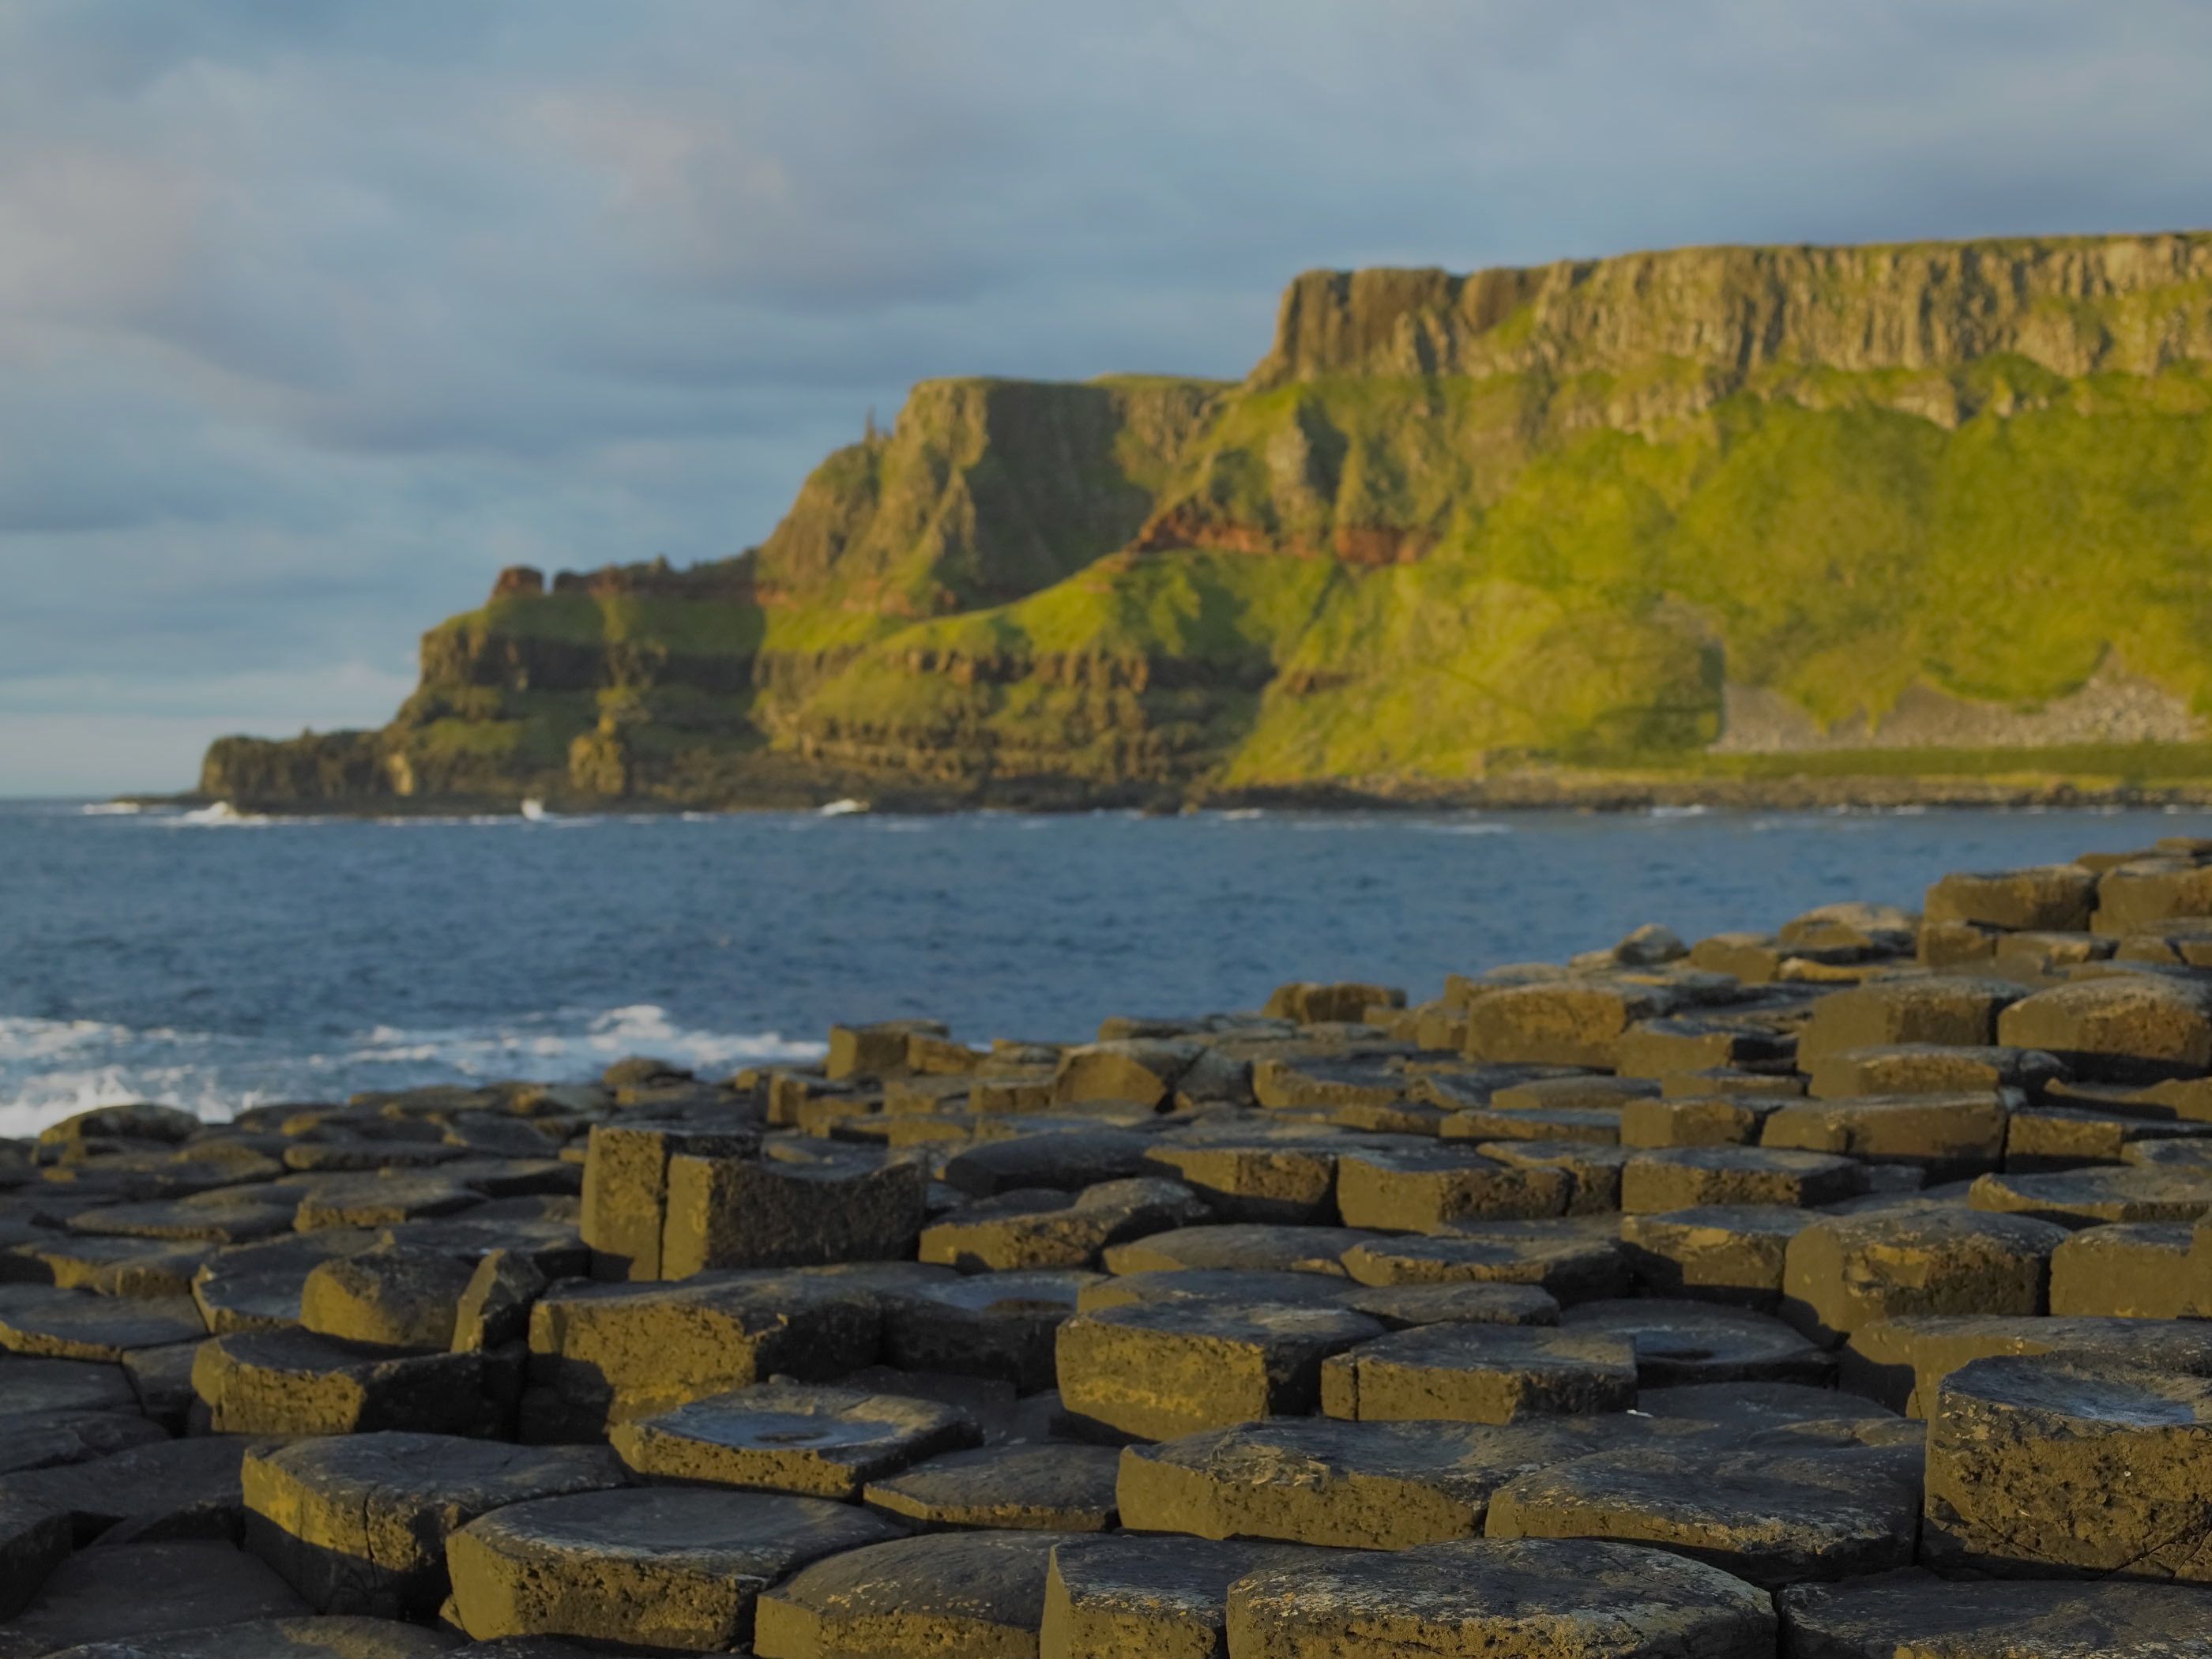 Ireland Landscape Wallpaper Giants Causeway County Antrim 2800x2100